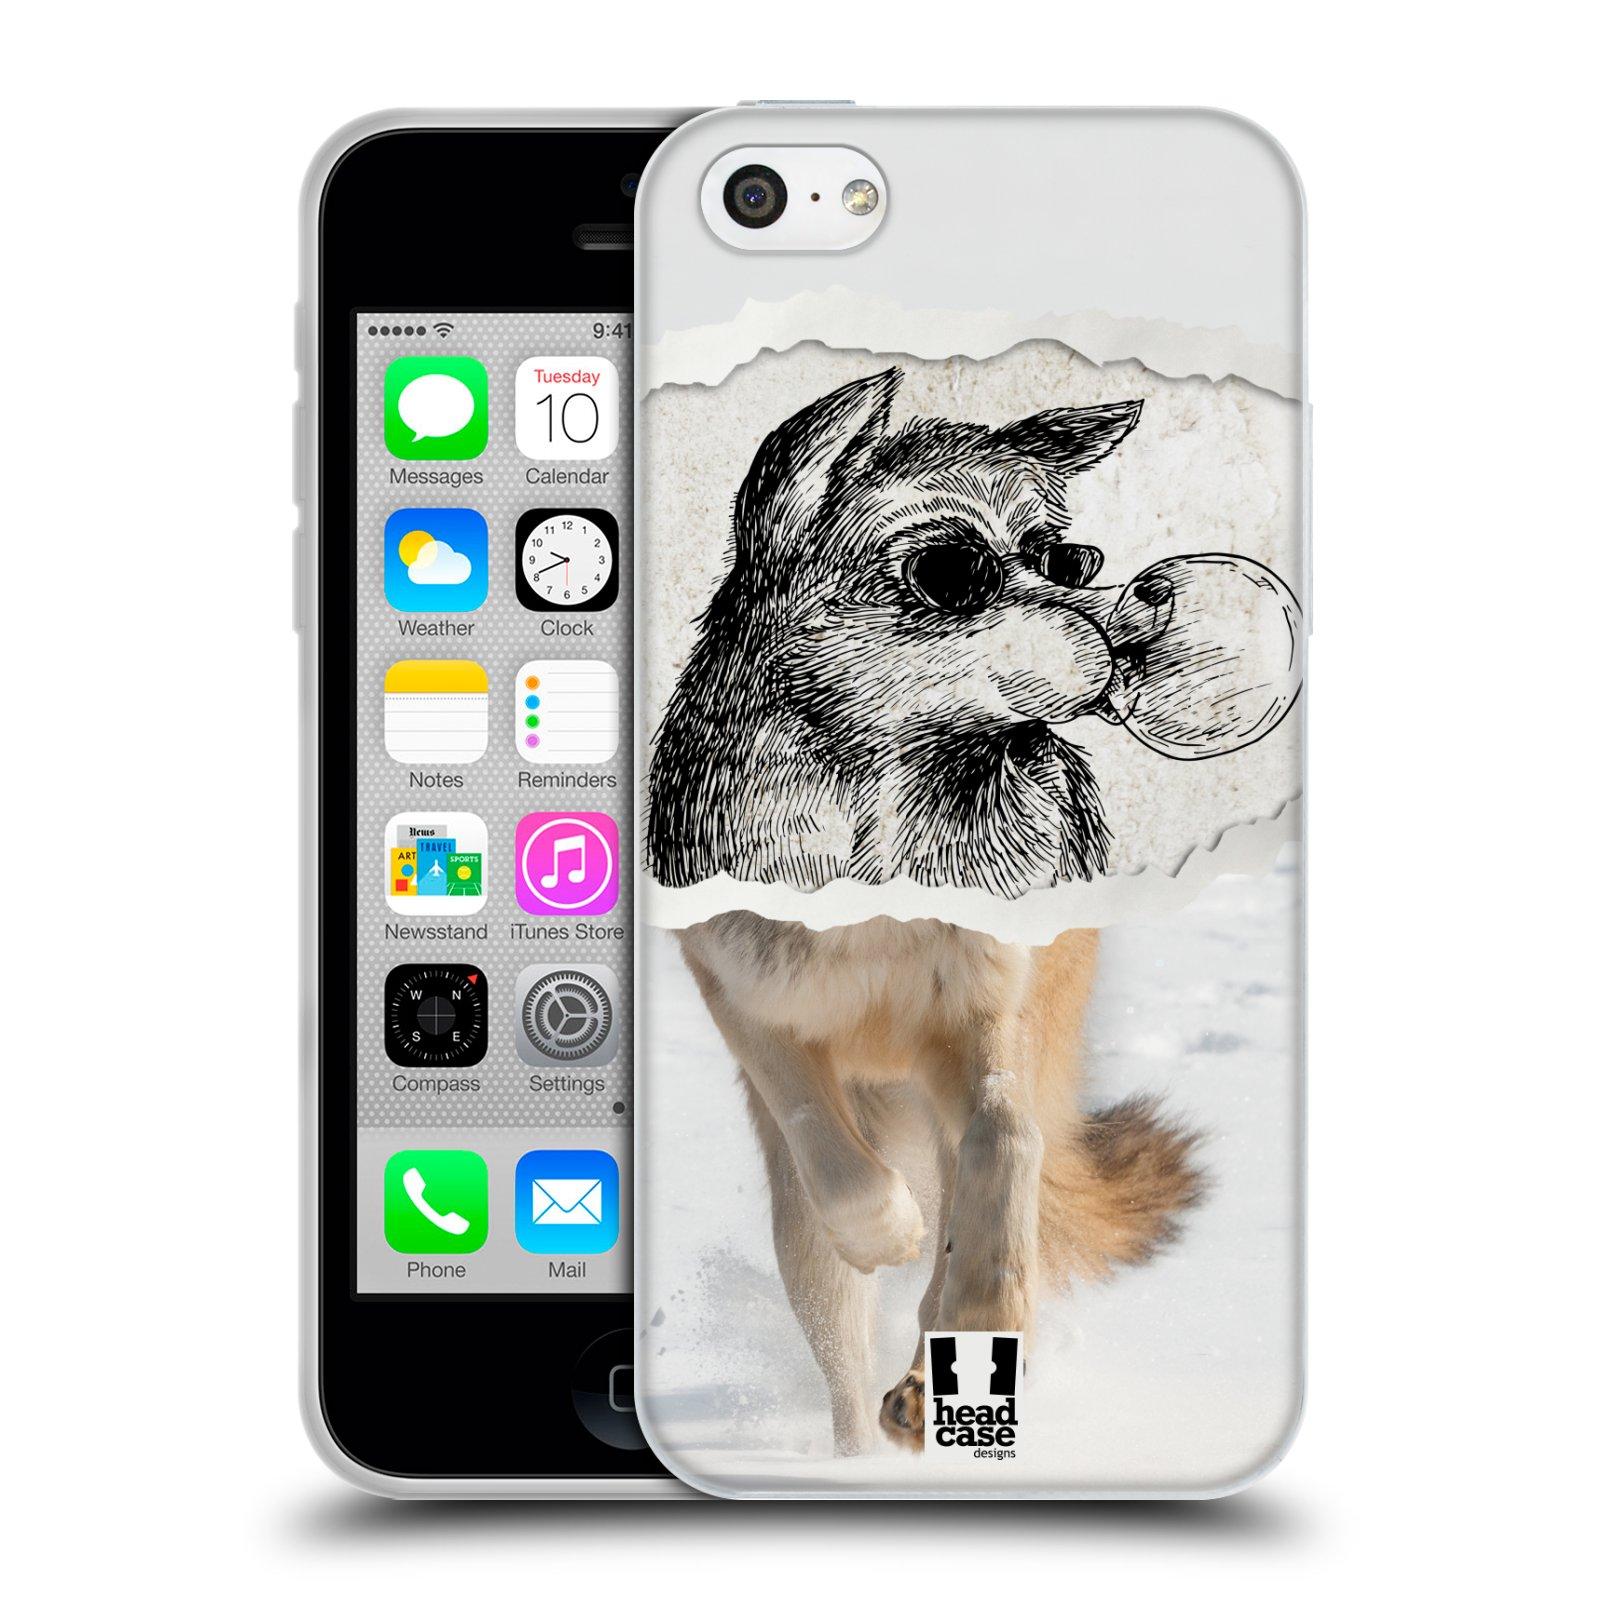 HEAD CASE silikonový obal na mobil Apple Iphone 5C vzor zvířata koláž vlk pohodář